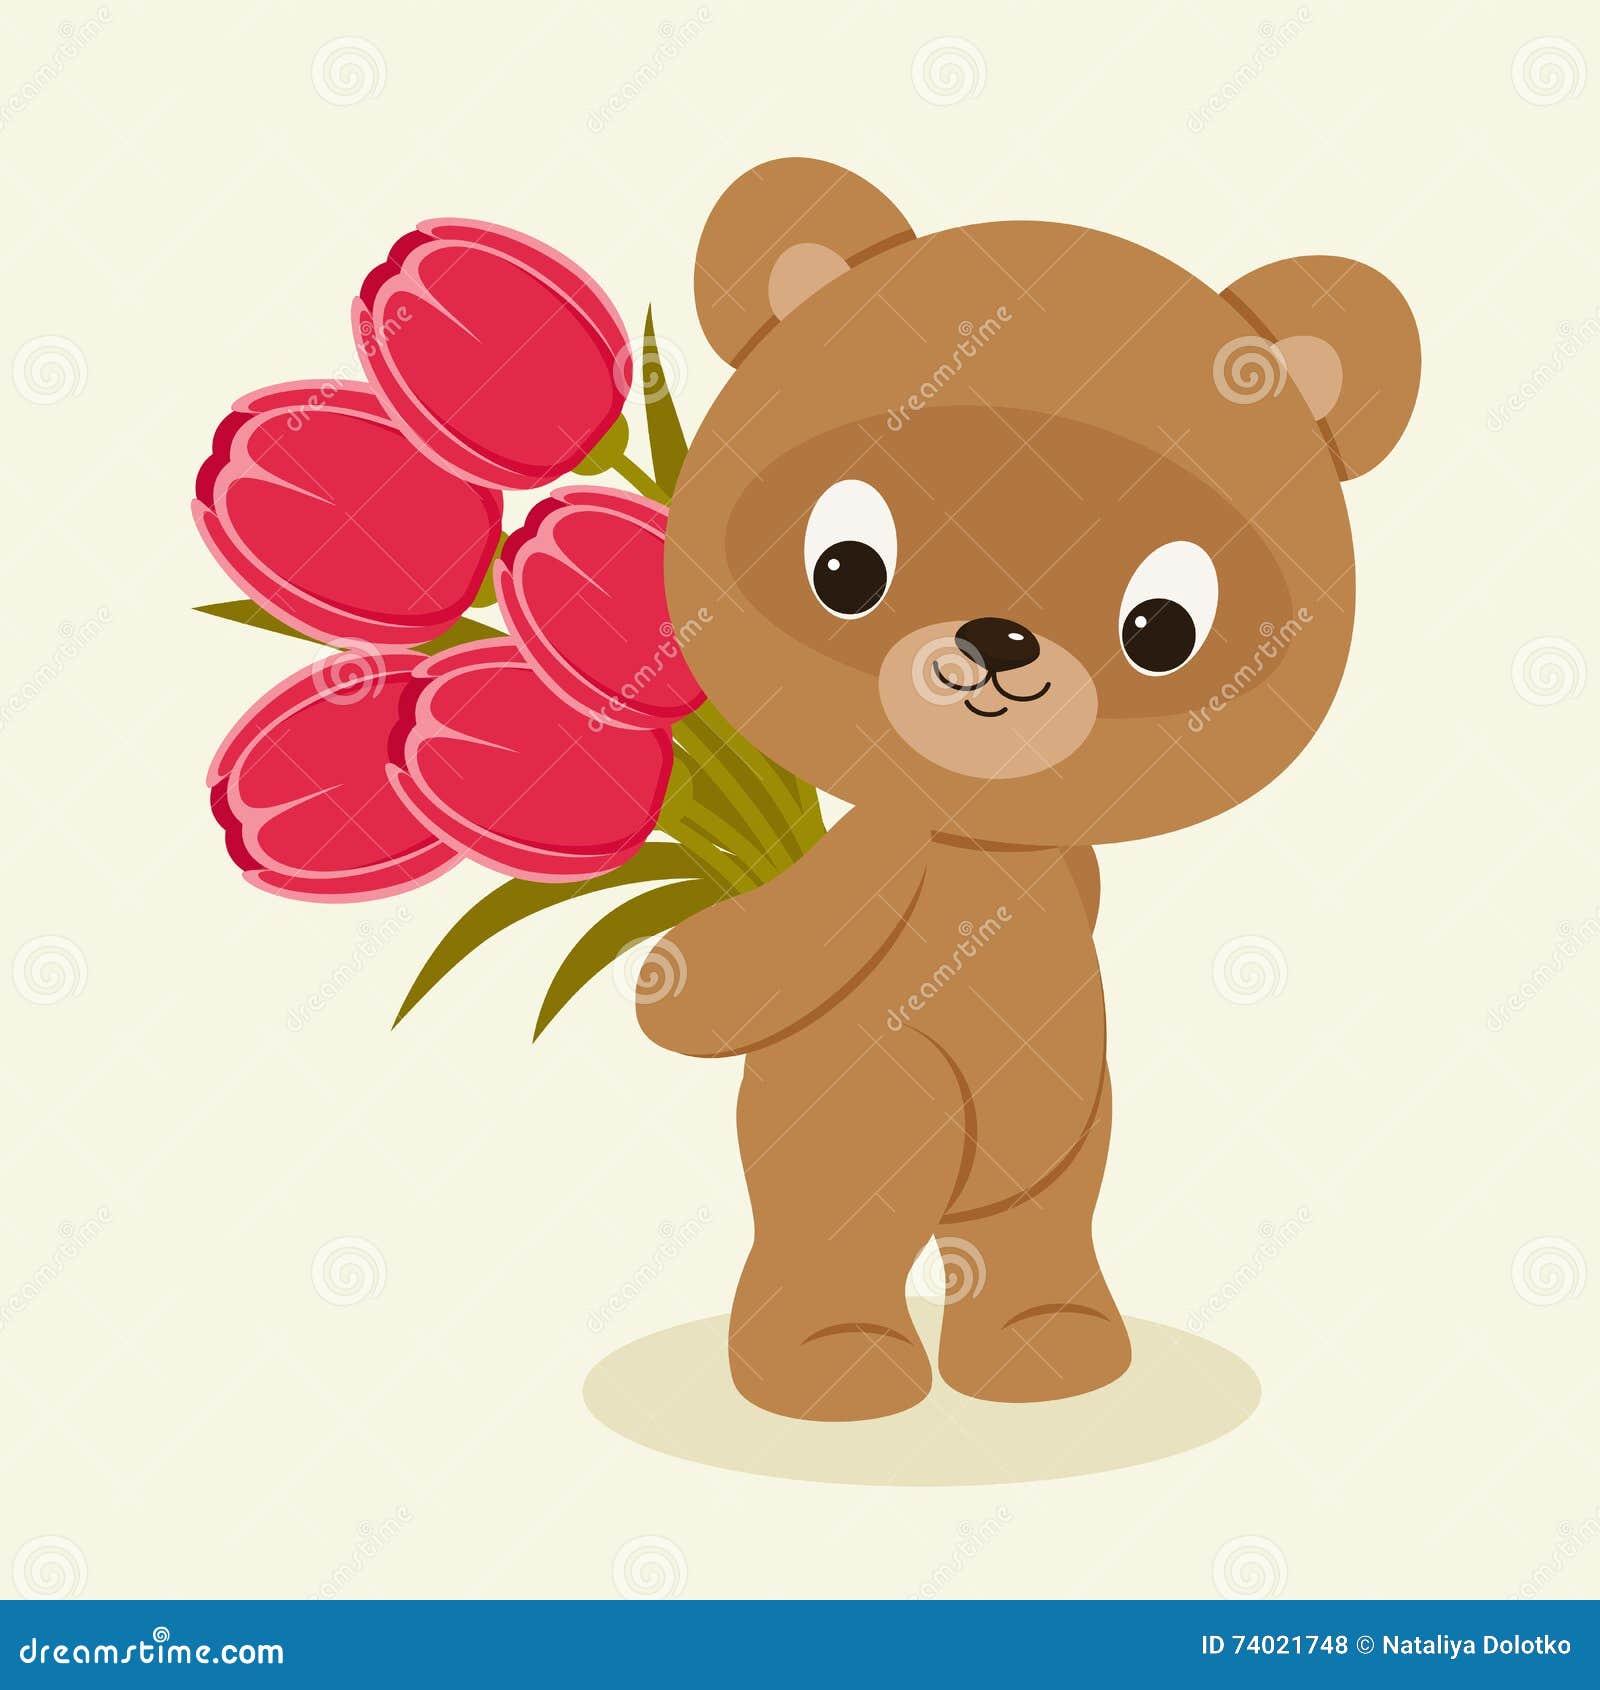 Teddy Bears Holding Flowers Cartoon Wiring Diagrams